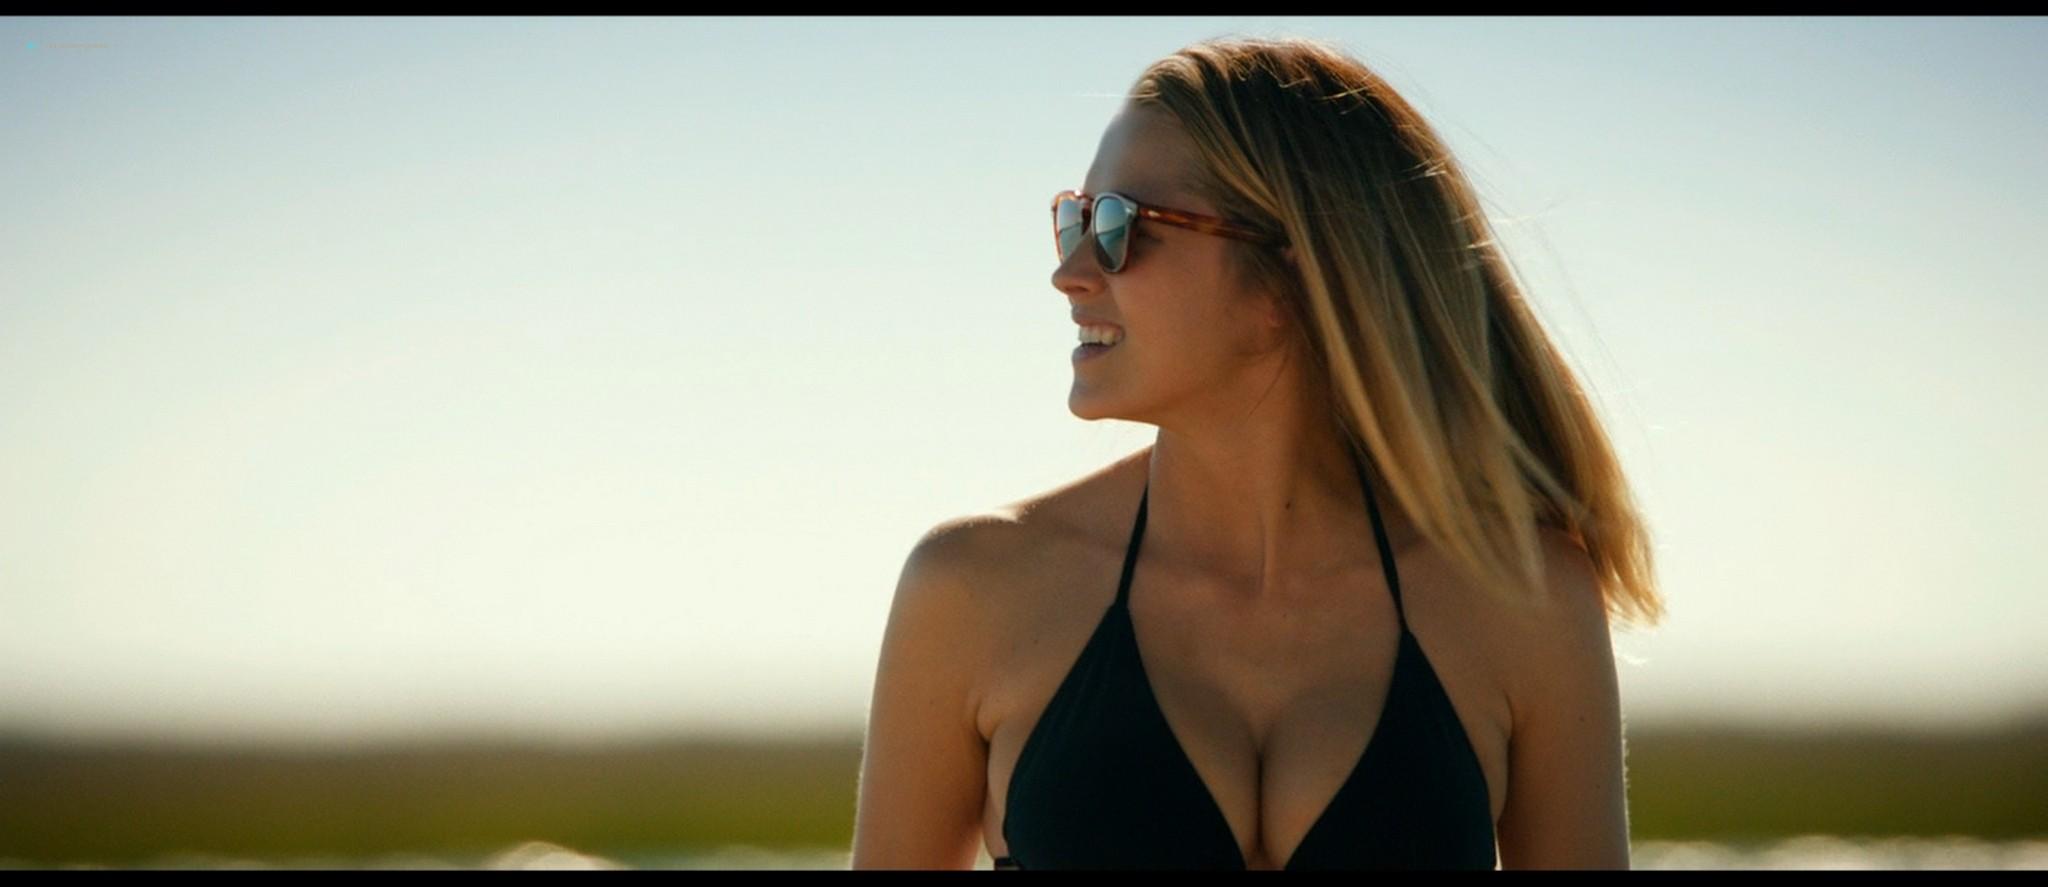 Teresa Palmer hot bikini and Maggie Grace, Alexandra Daddario hot too - The Choice (2016) HD 1080p BluRay (10)